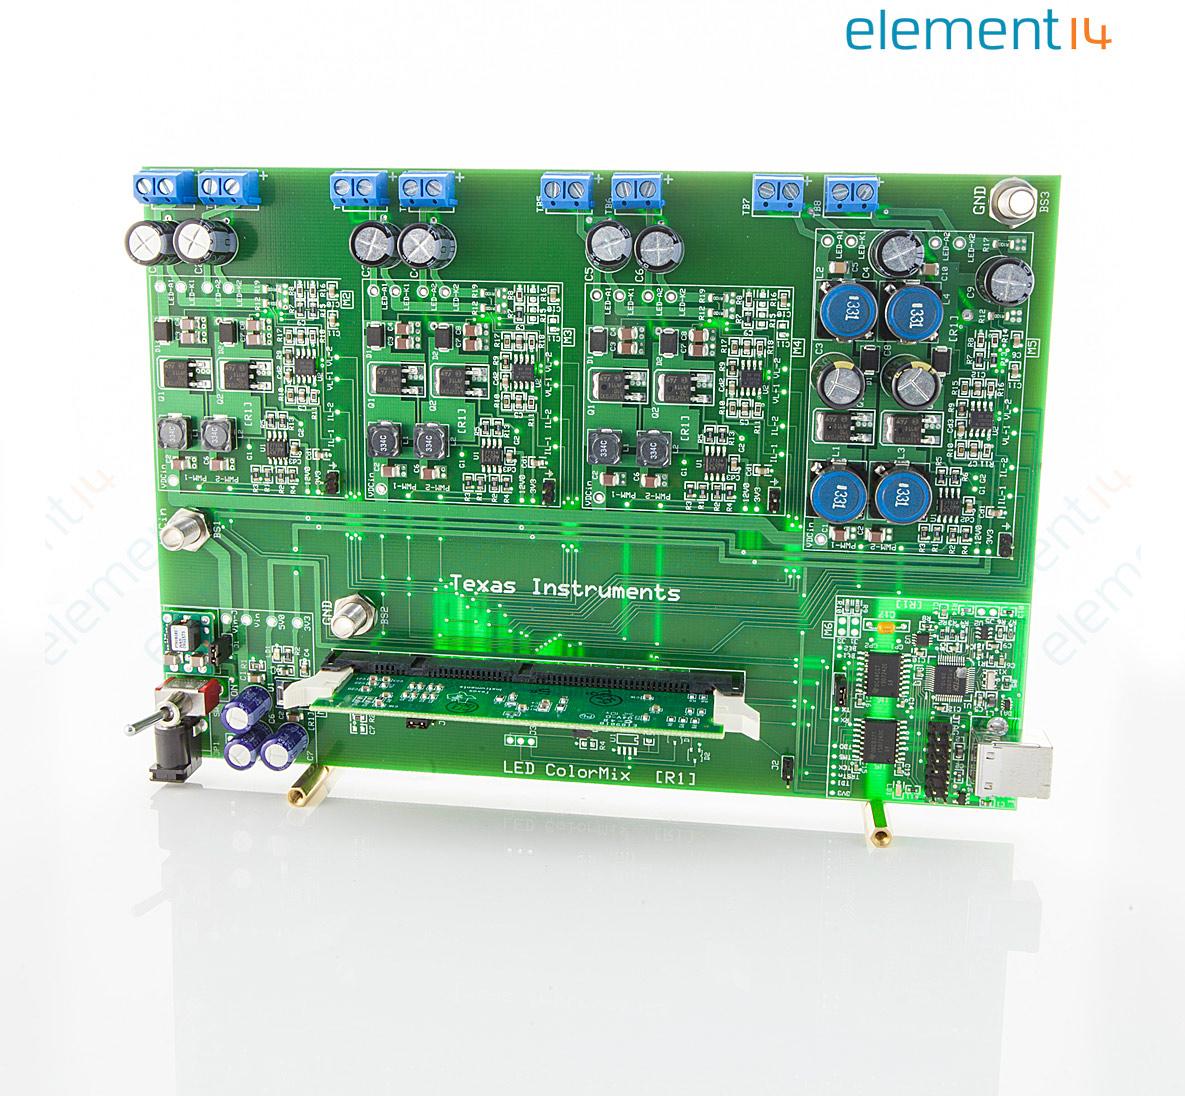 Tmdsrgbledkit Texas Instruments Development Kit Tms320f28027 Led Tri Color Circuit Controller Driver Multi Dc Colour Pwm Dimming 1 Output